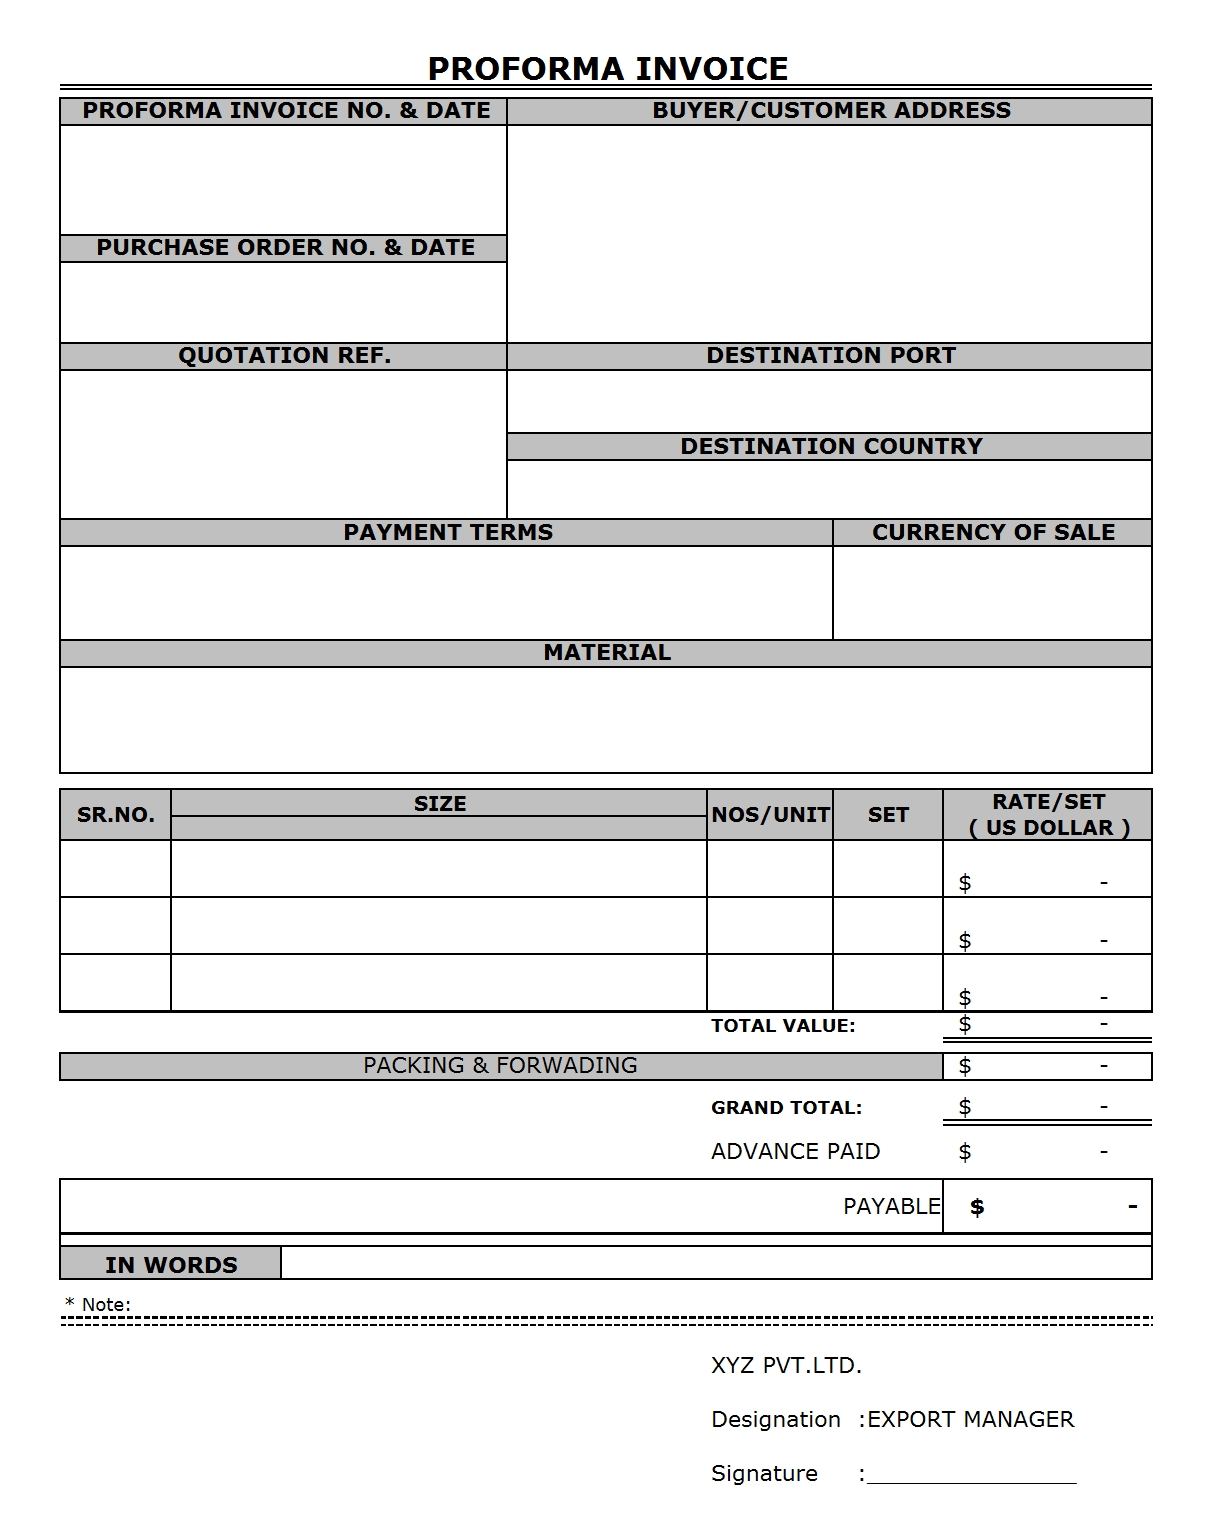 proforma invoice template free download invoice template proforma invoice for international shipments 1208 X 1533